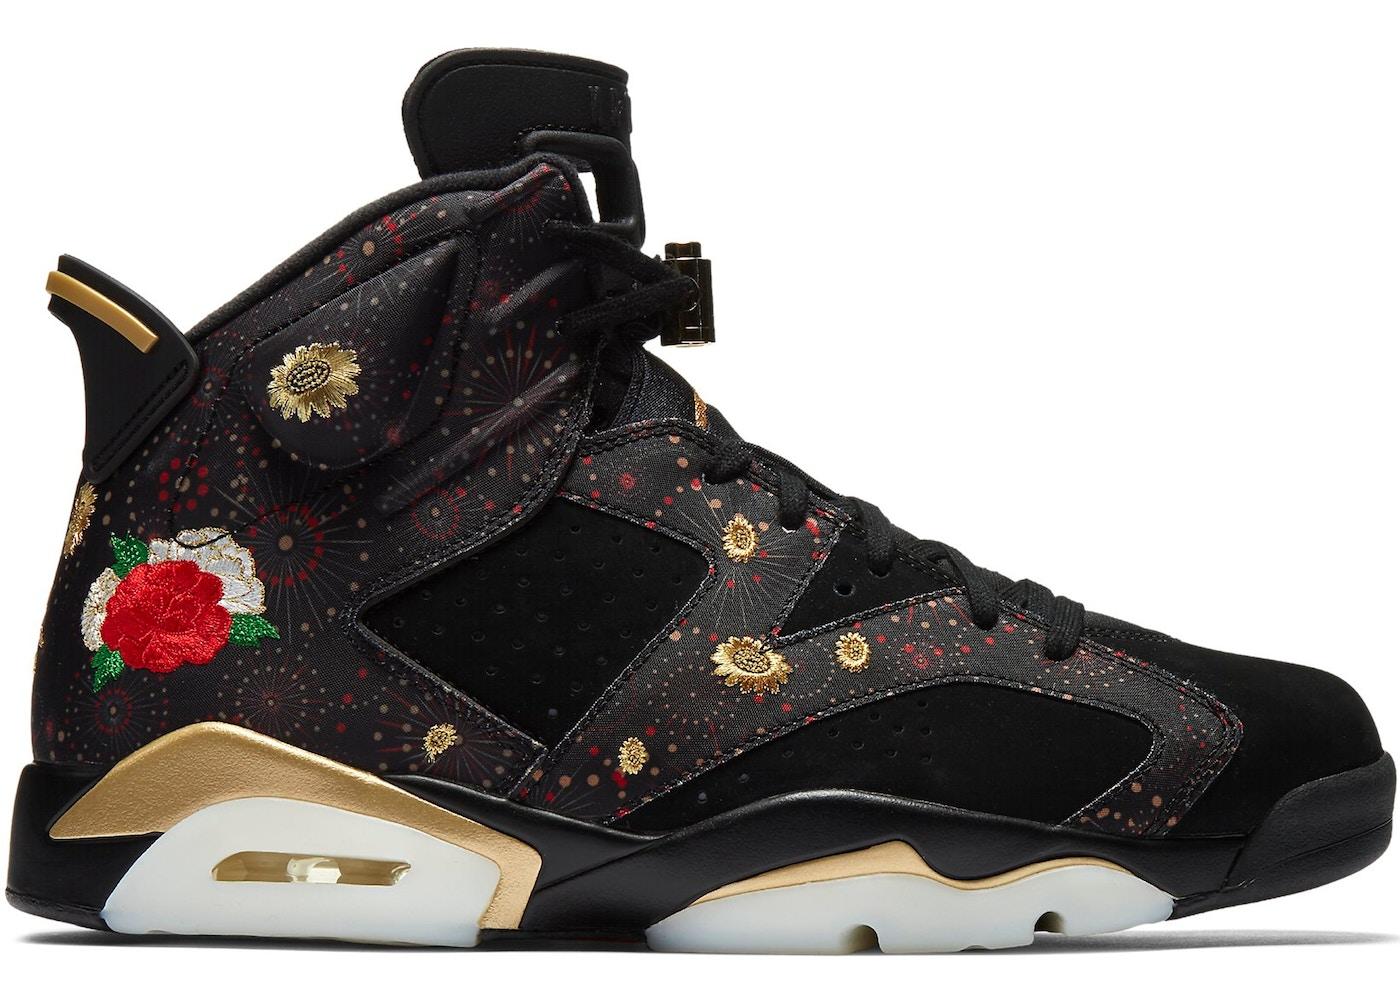 Buy Air Jordan 6 Size 17 Shoes   Deadstock Sneakers 6b0d0193e49c